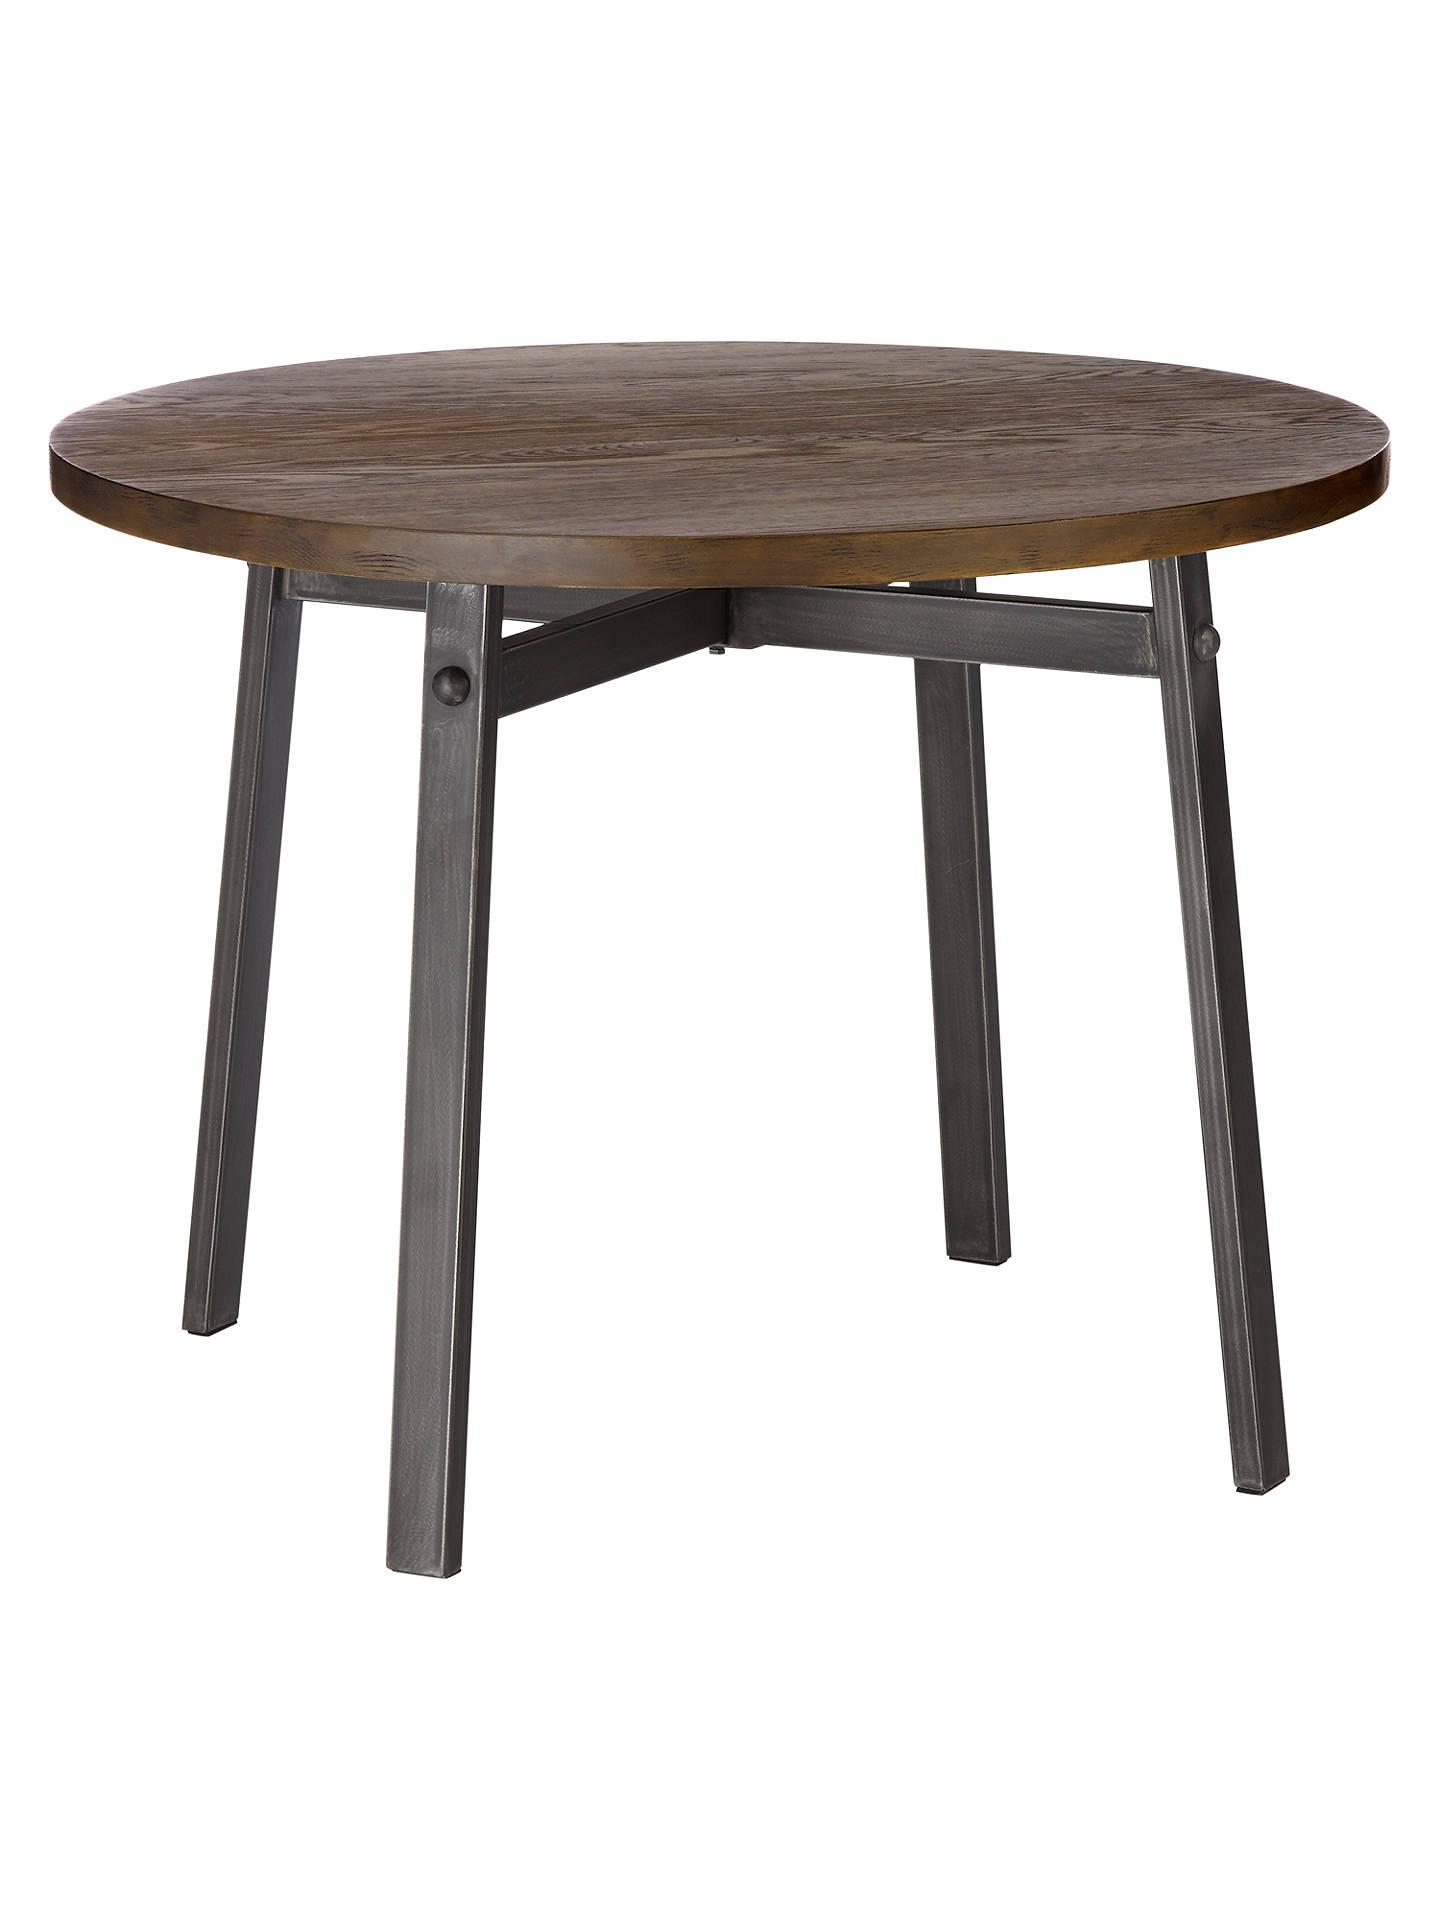 john lewis calia round dining table at john lewis partners. Black Bedroom Furniture Sets. Home Design Ideas